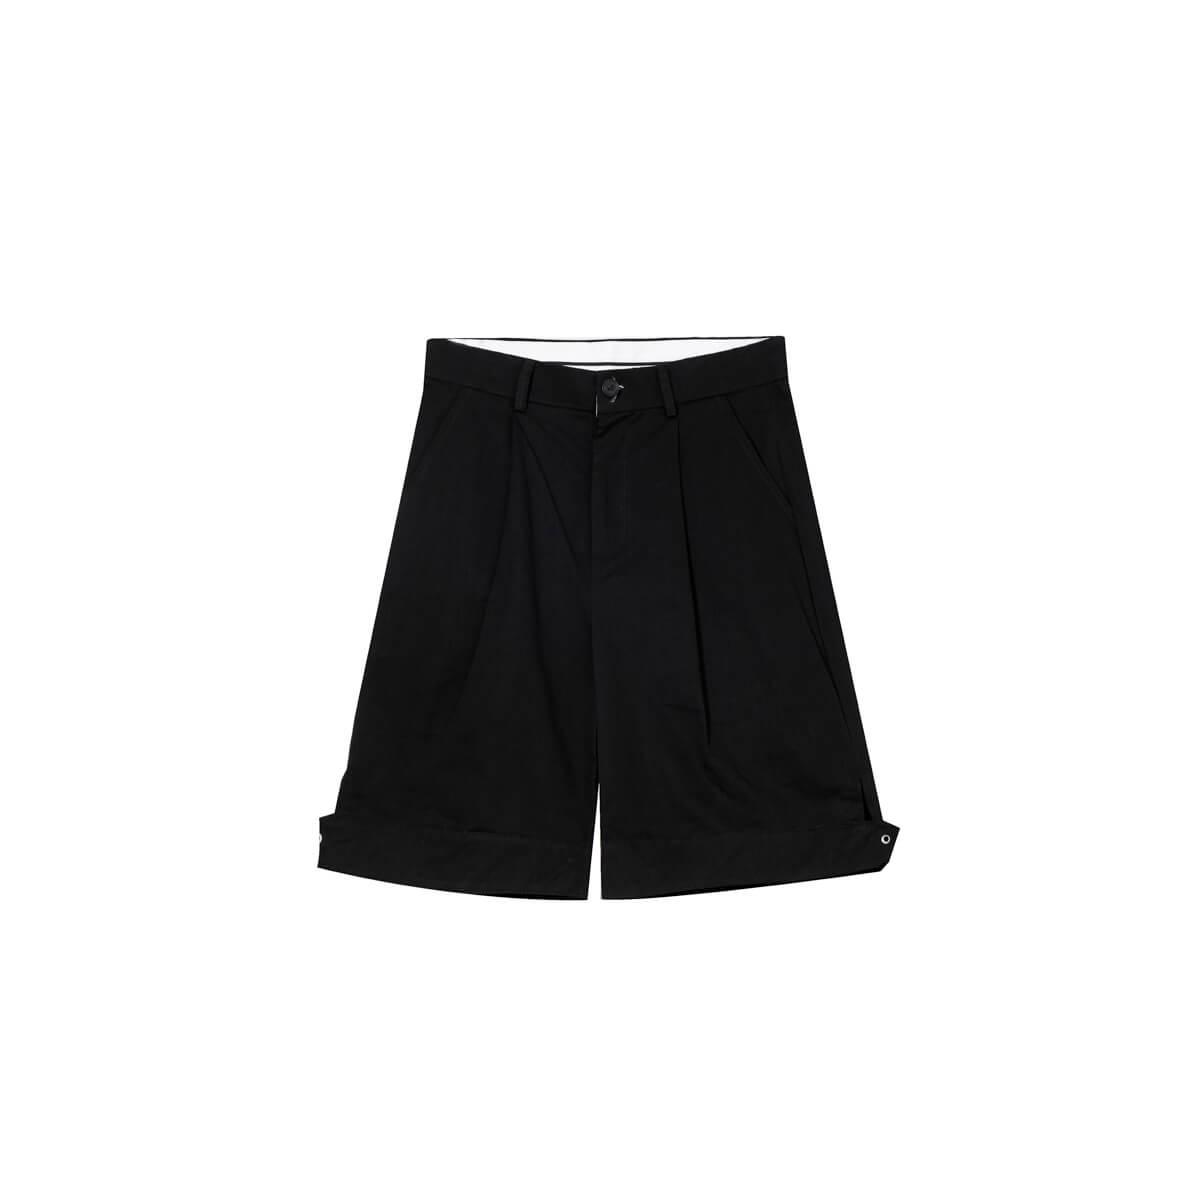 Шорты Cui Layout Studio Wide Leg Shorts Black